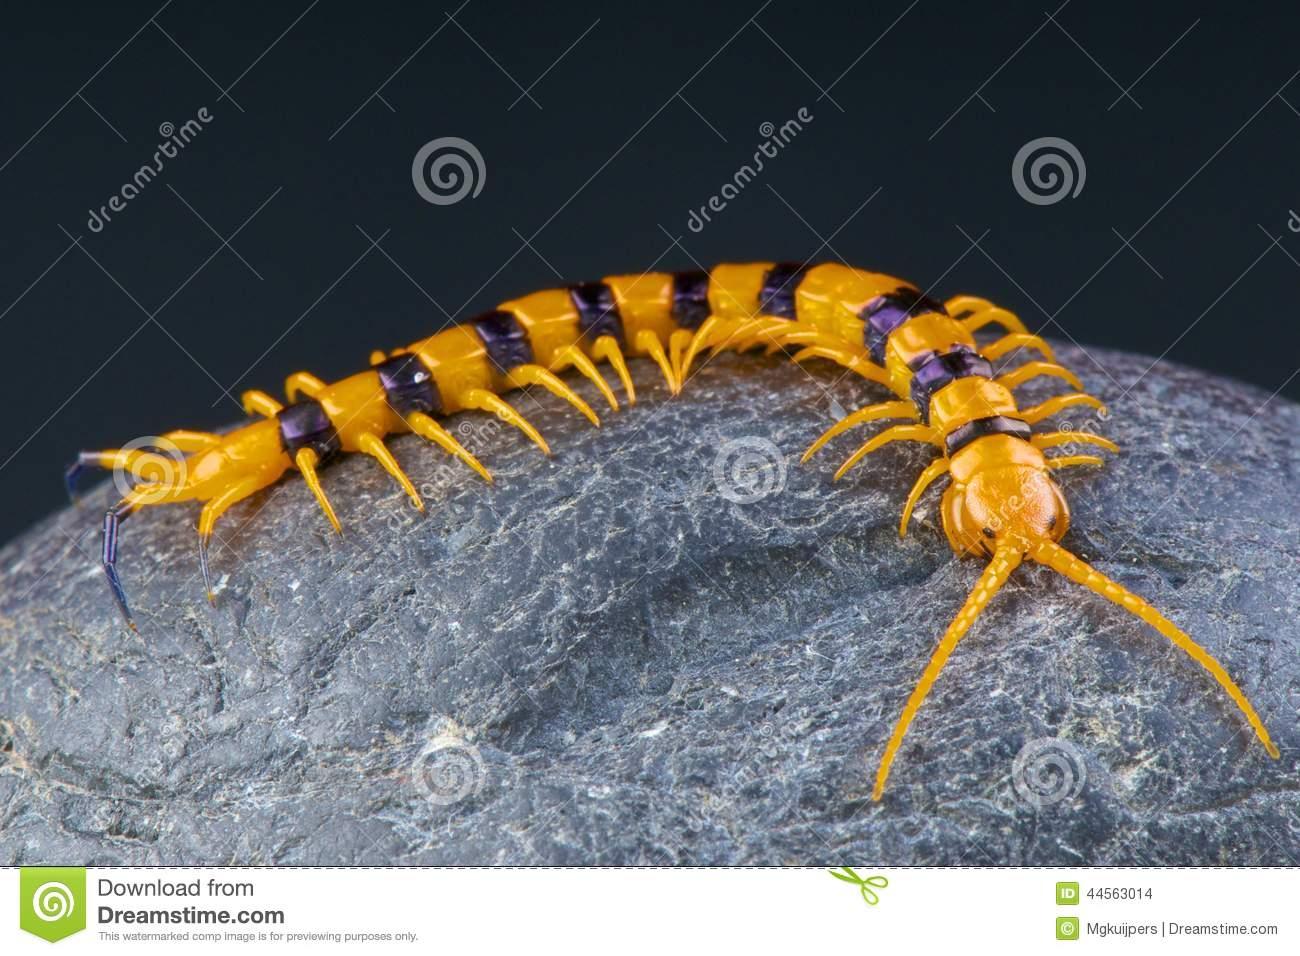 Giant Centipede / Scolopendra Hardwickei Stock Photo.